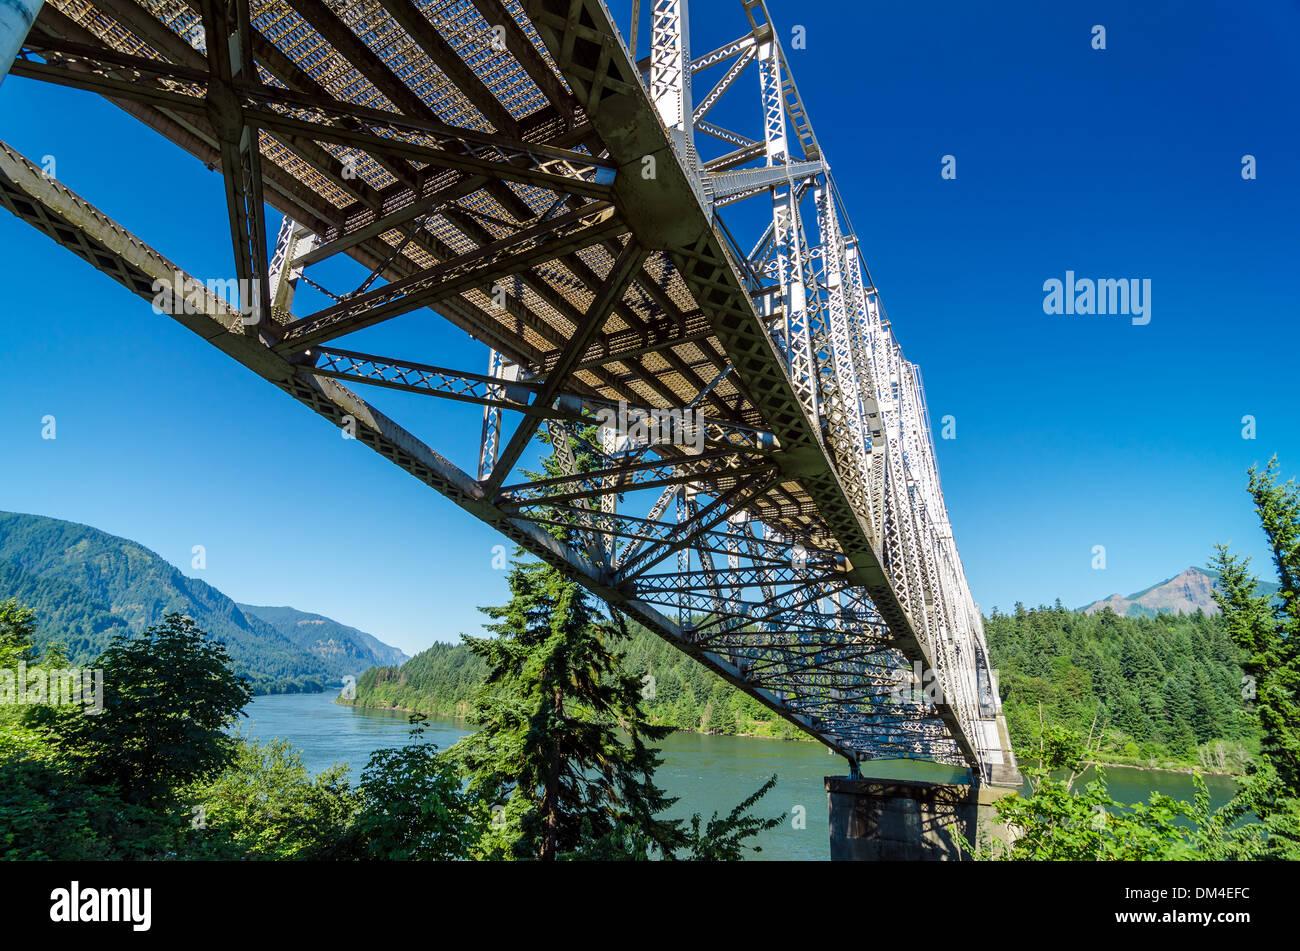 Bridge of the Gods passing over the Columbia River in Cascade Locks, Oregon - Stock Image